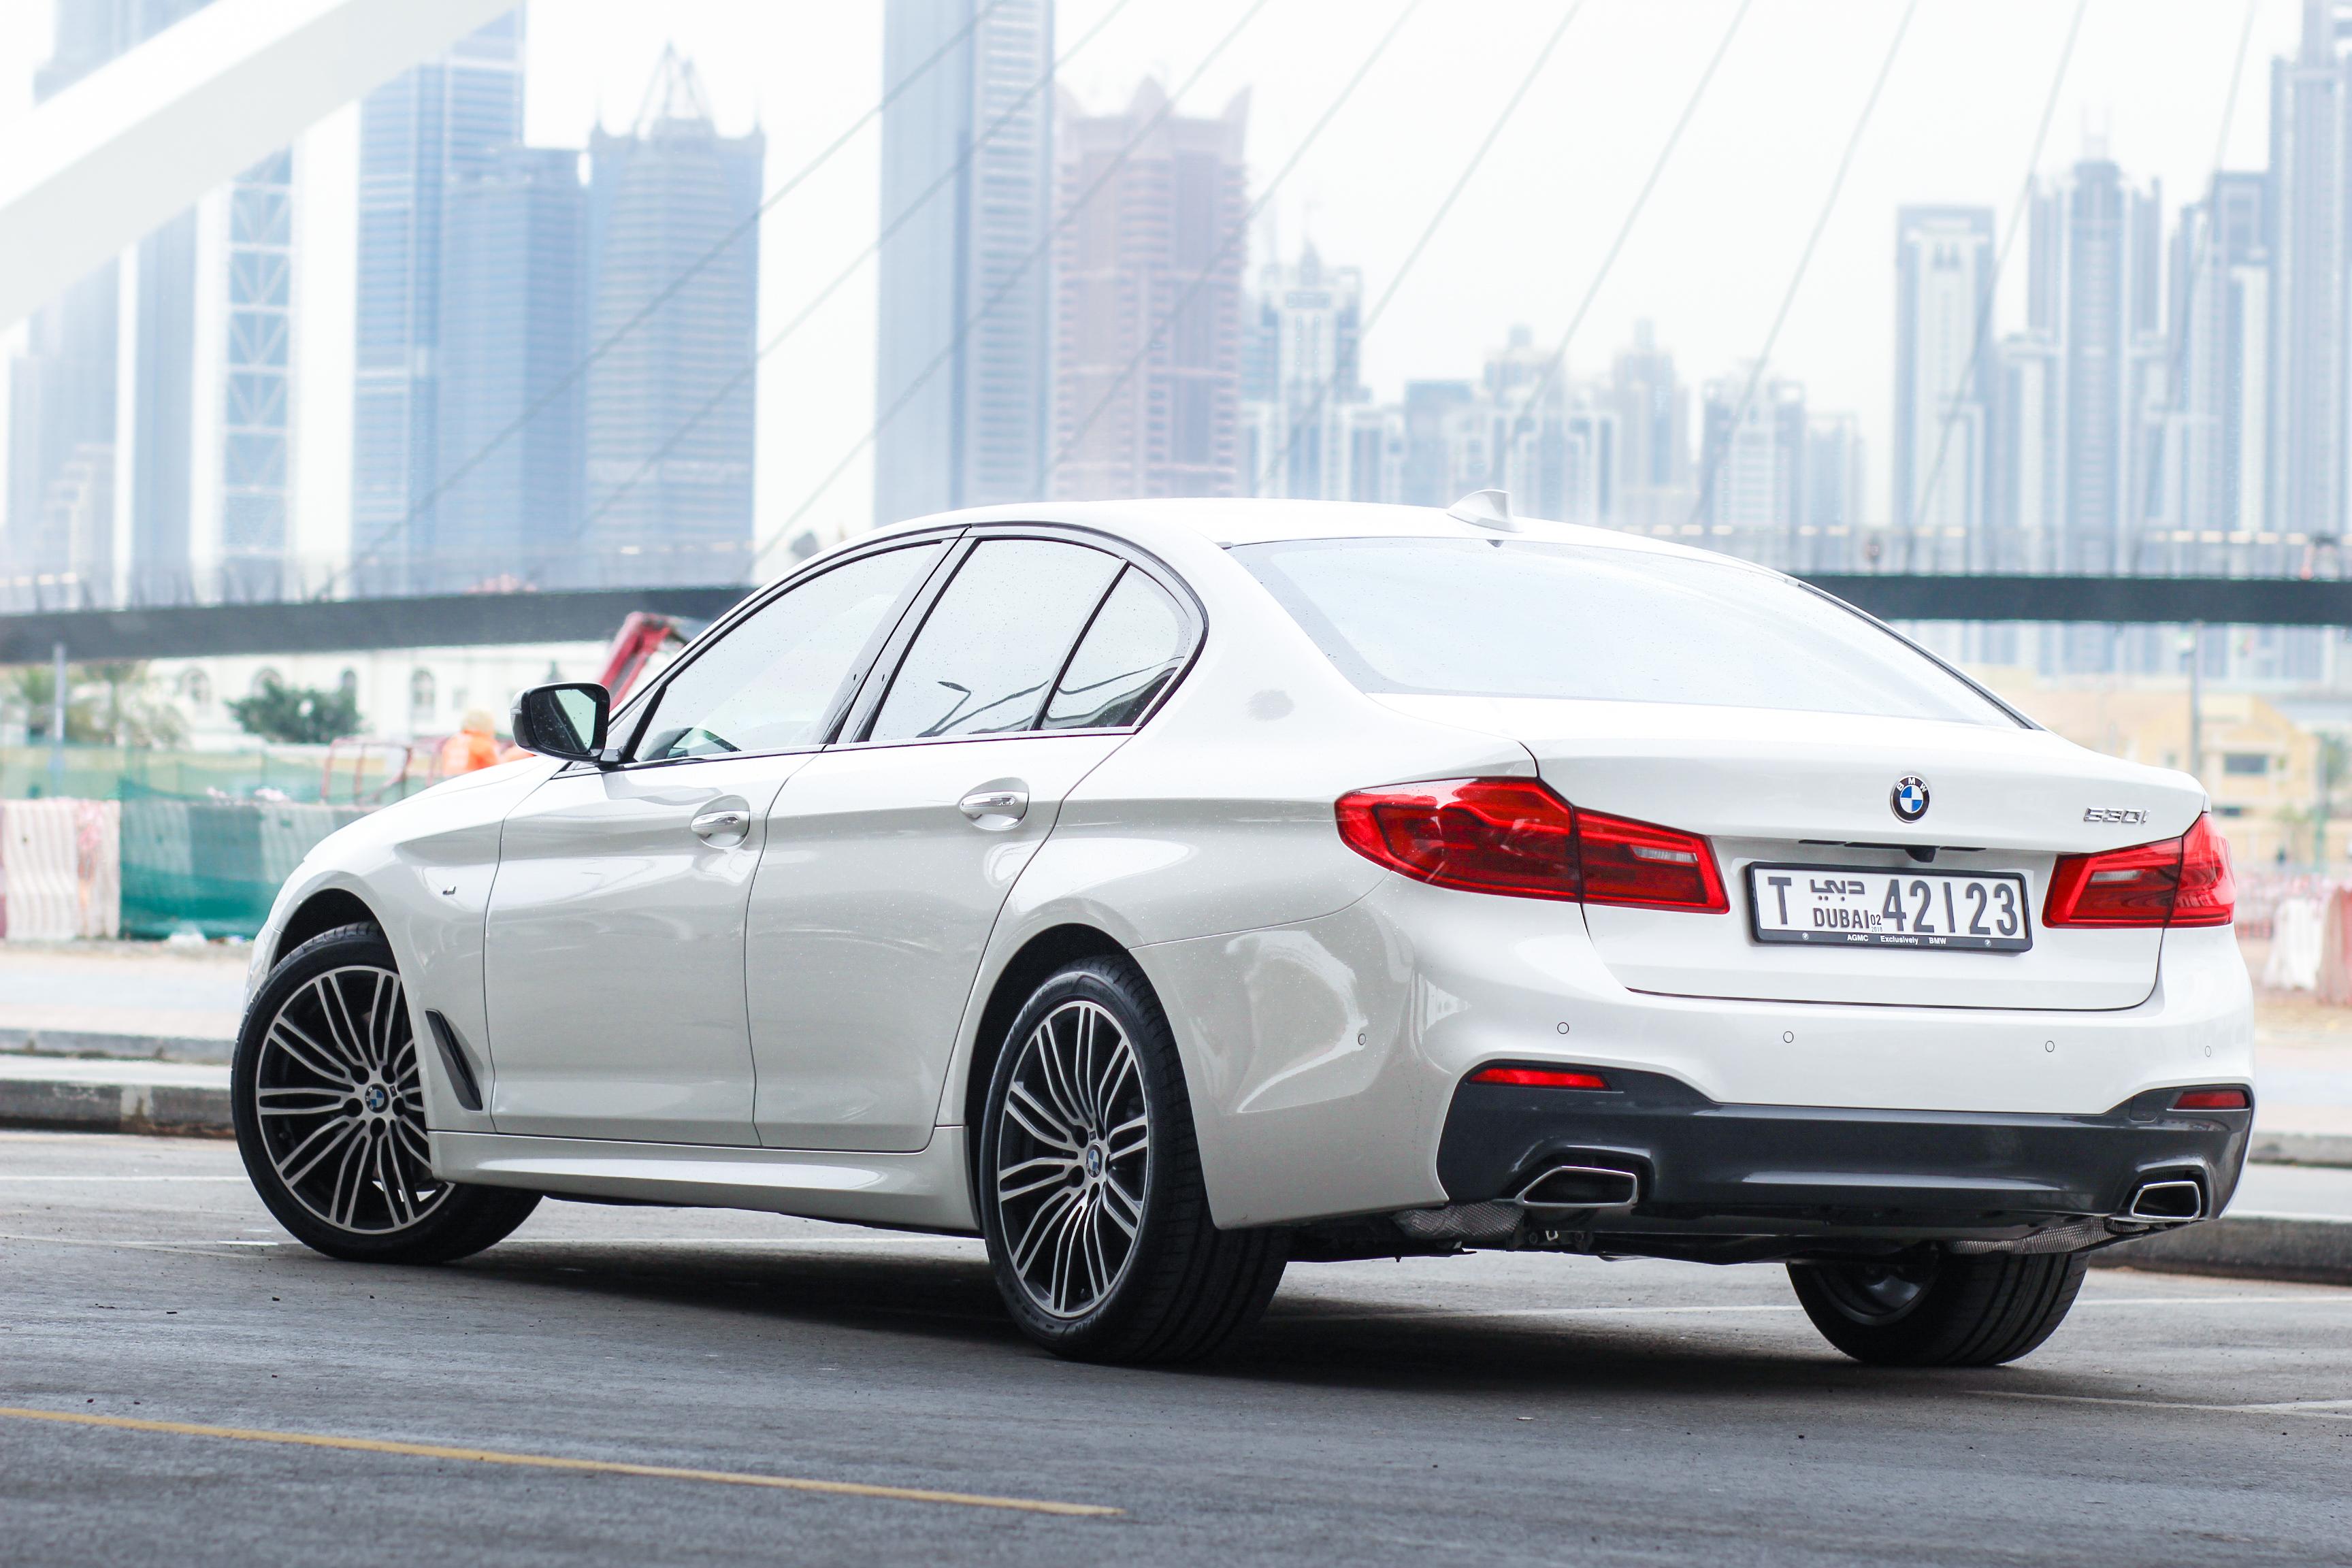 The All New BMW 5 Series 5er G30 Testdrive Premiere Lifestyle Car Cars Automobile LuxuryCars BMWConnected Dubai AGMC SheerDrivingPleasure FreudeAmFahren BMWAG